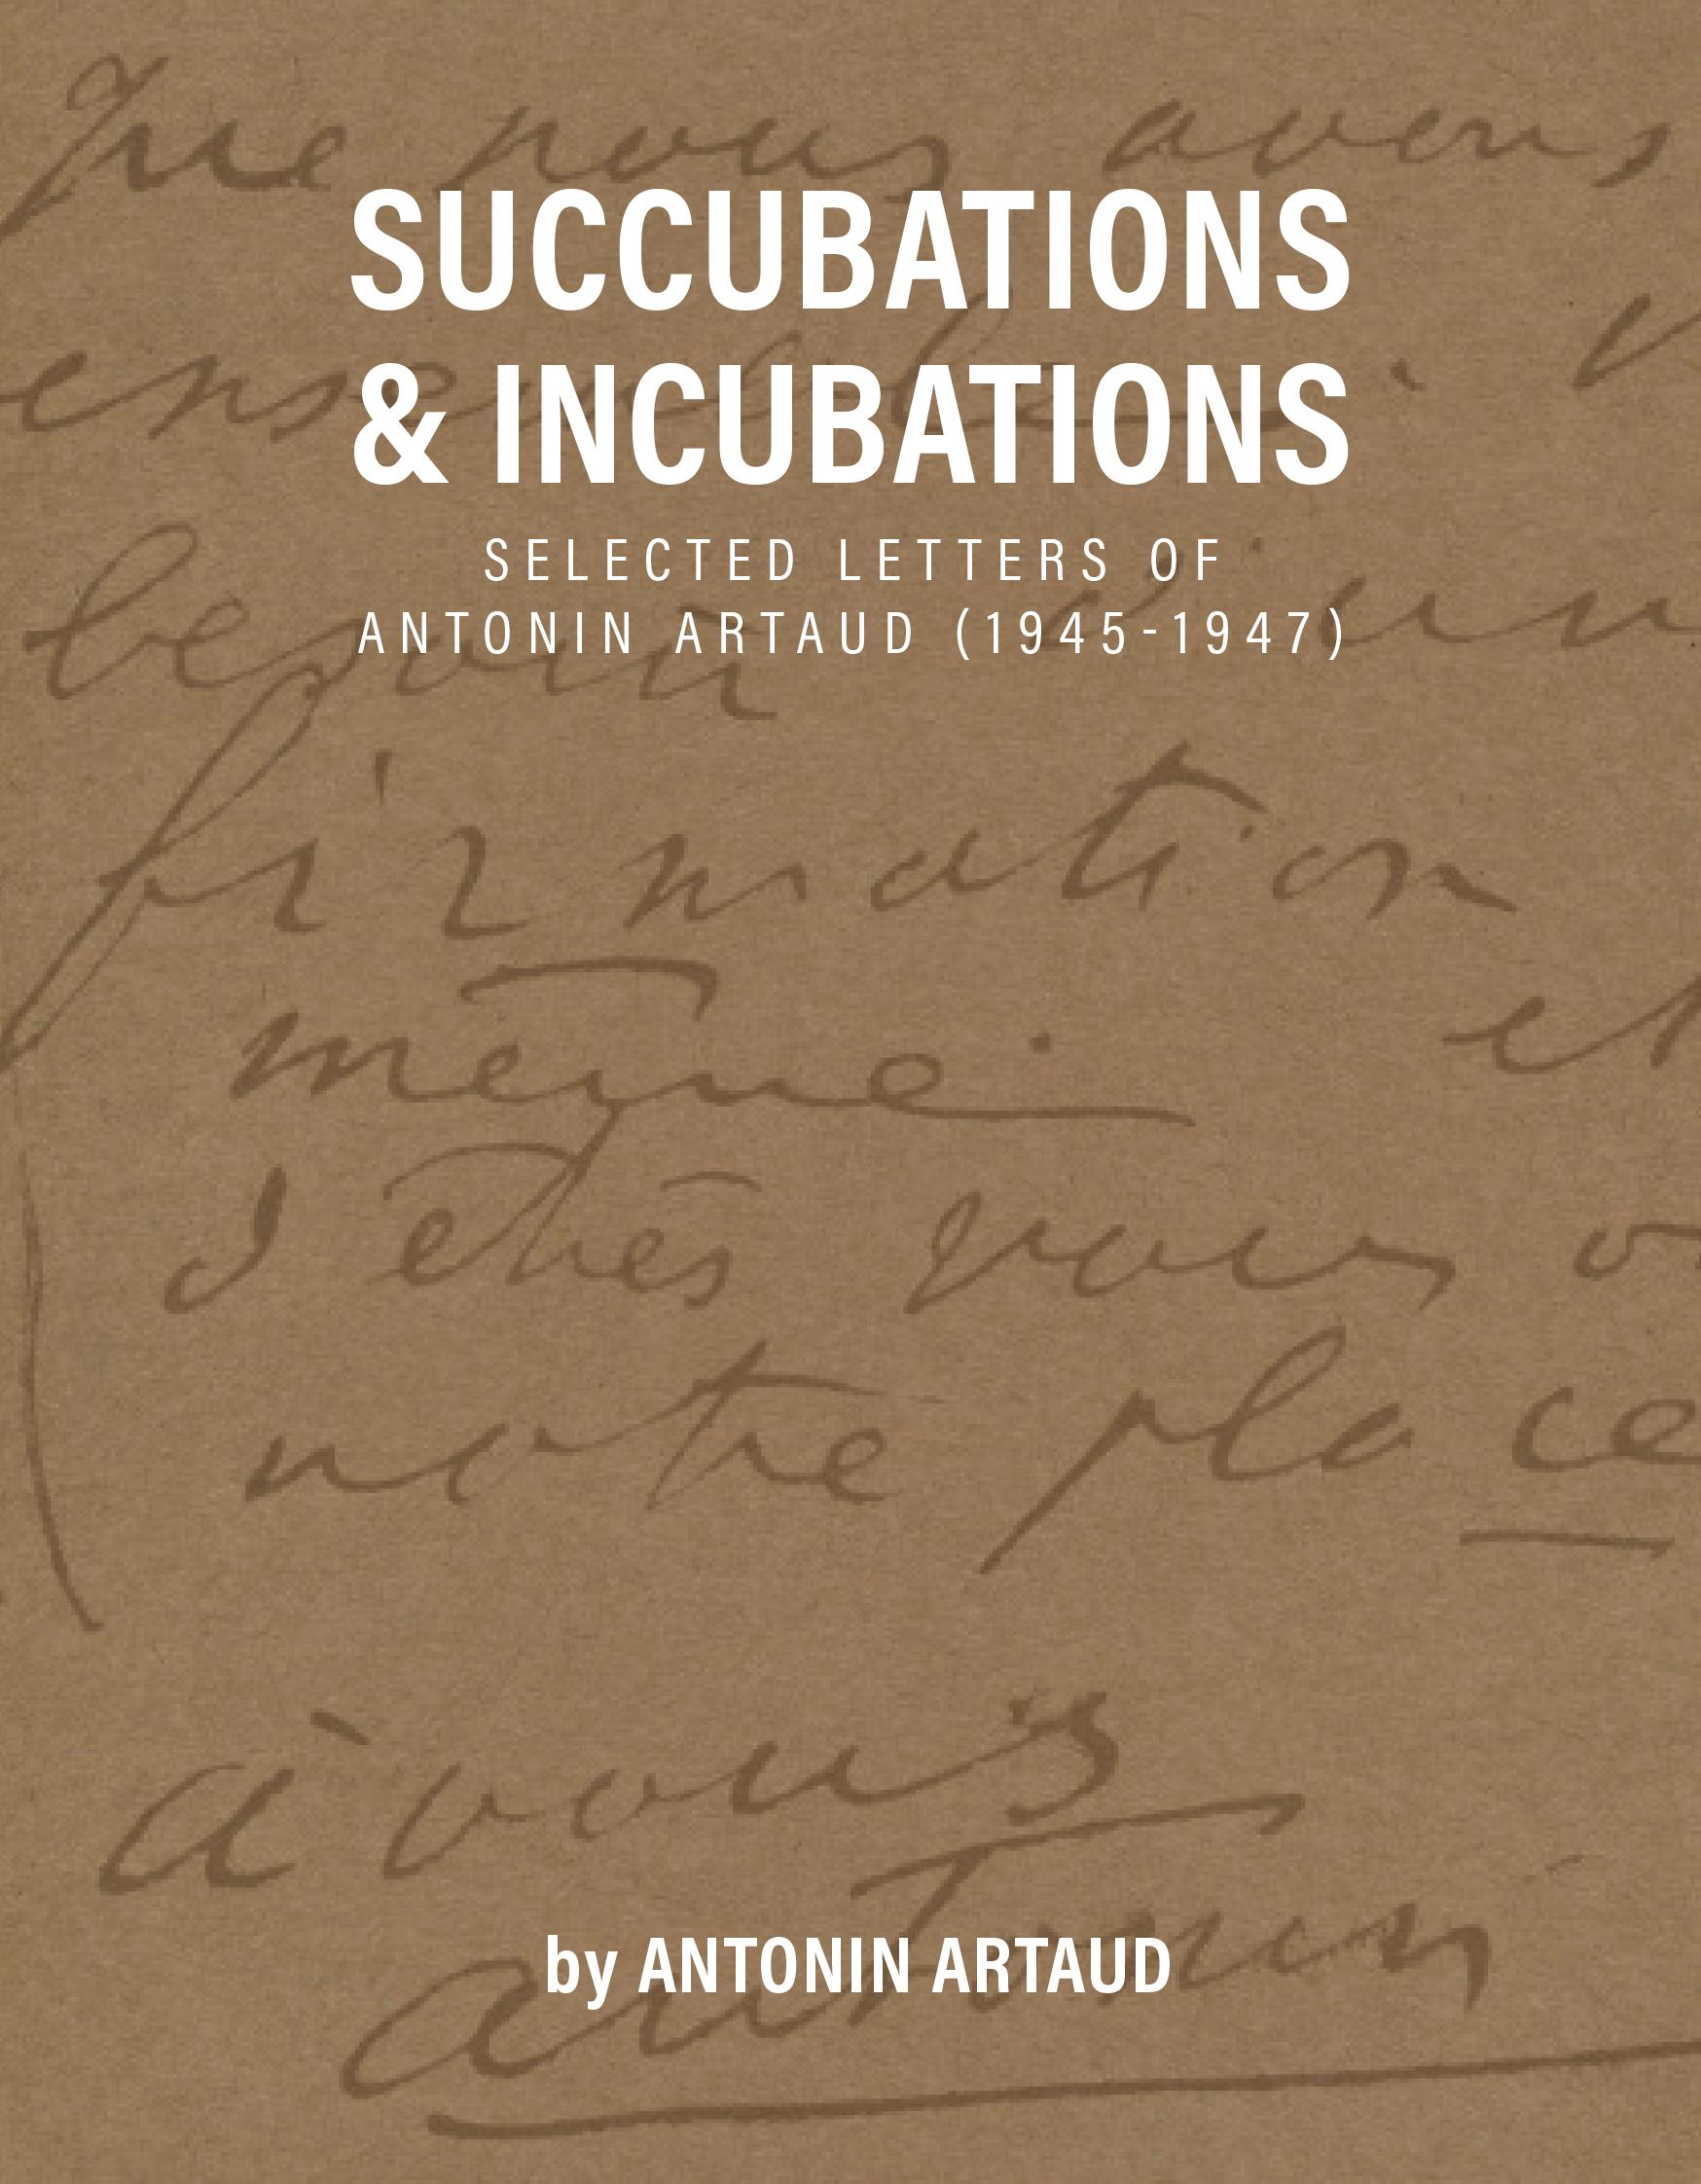 Succubations & Incubations: Selected Letters of Antonin Artaud [1945-1947]